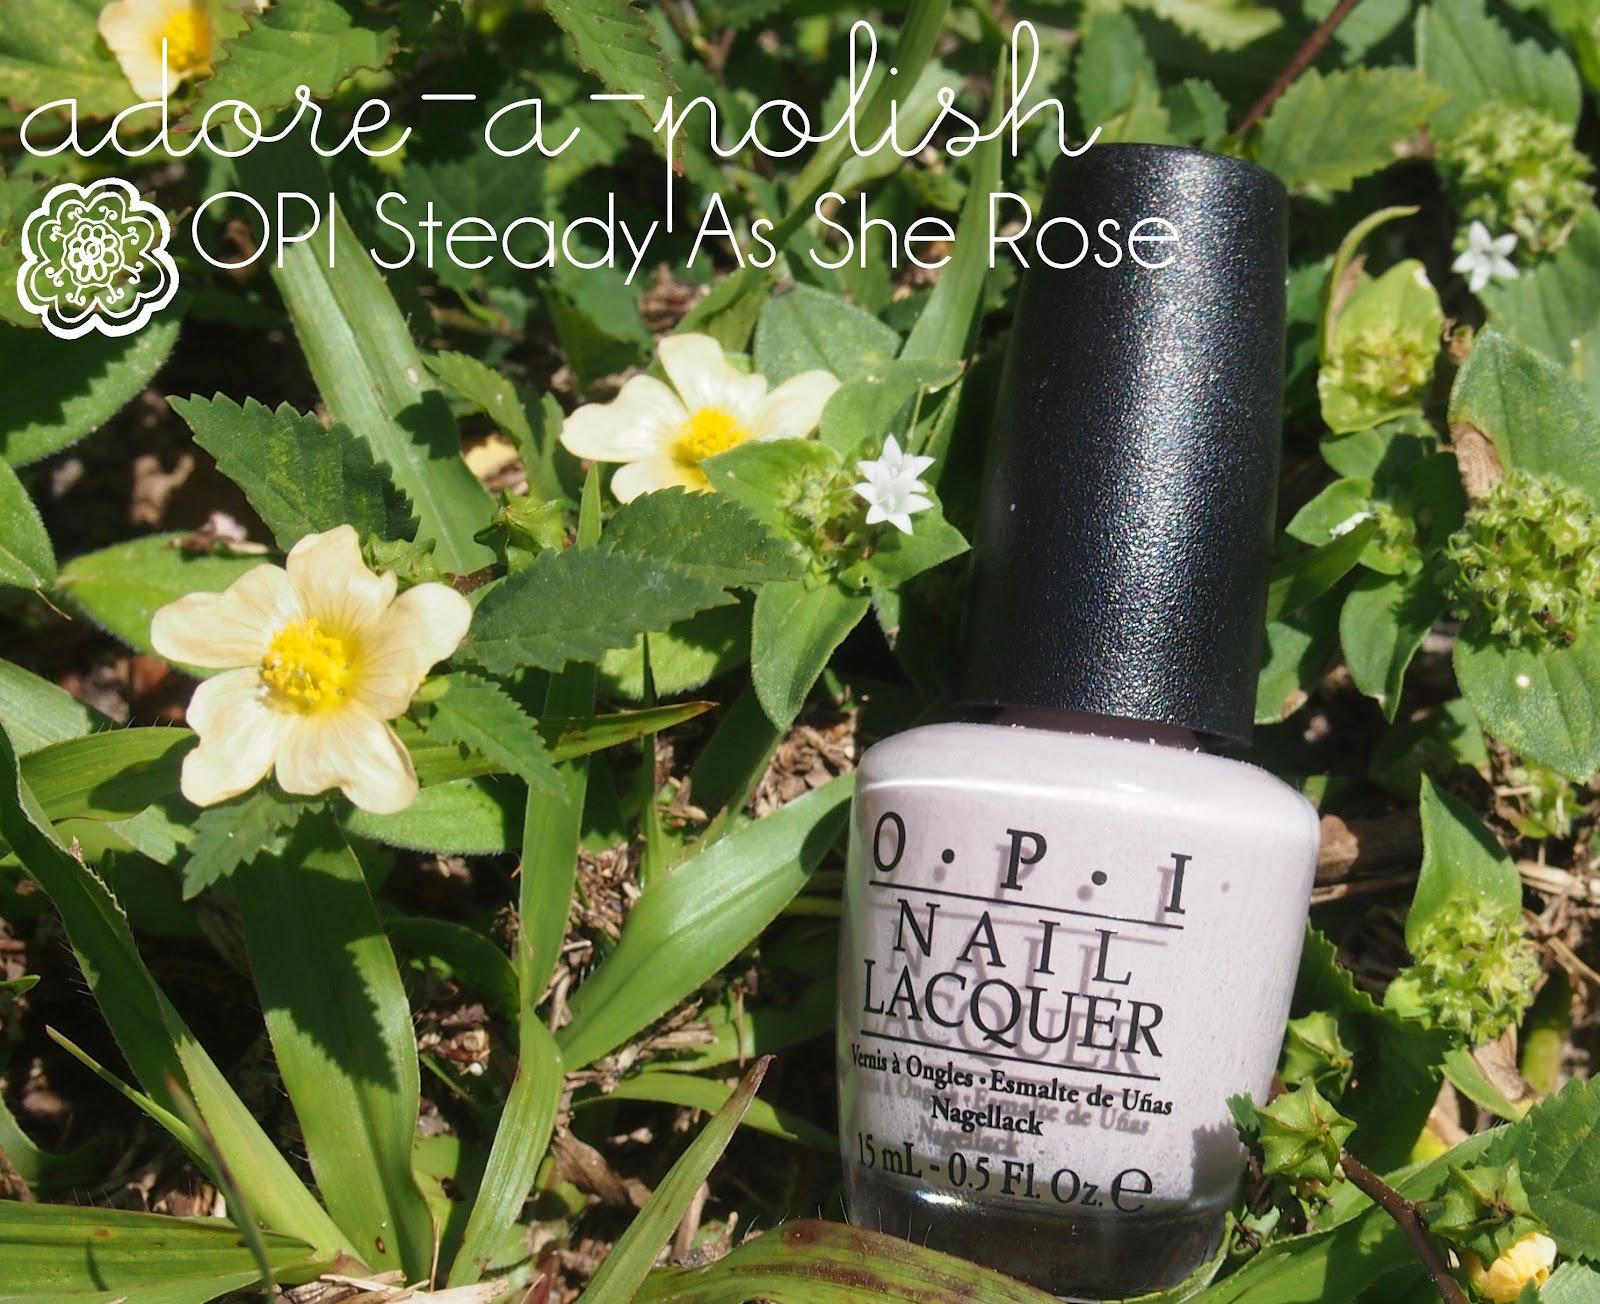 OPI Steady As She Rose - Adore A Polish: A simple beauty blog